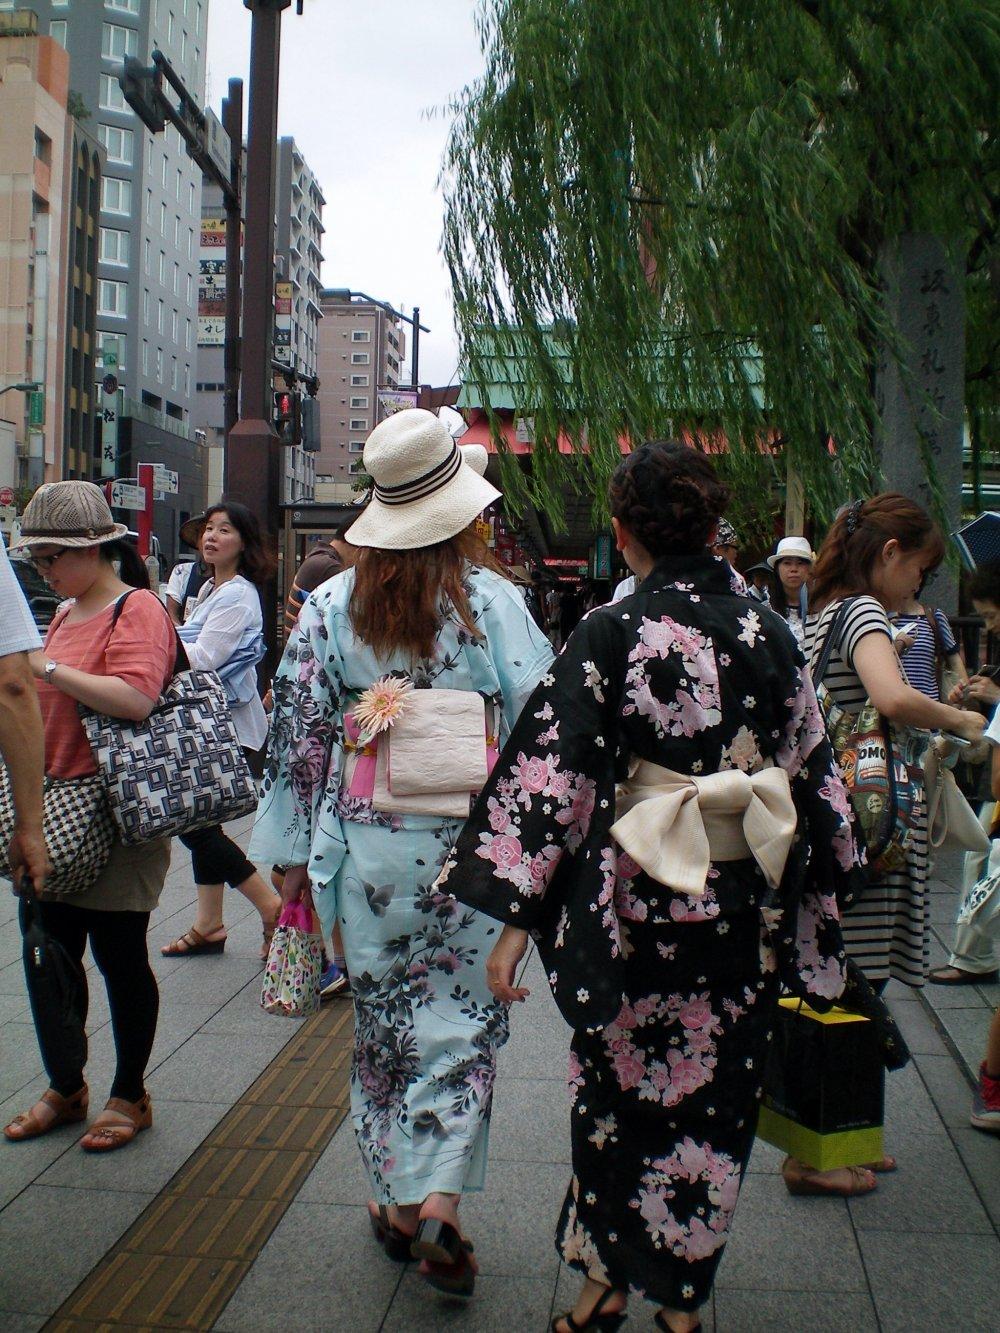 Anda biasanya dapat melihat orang-orang dalam pakaian tradisional di Asakusa.